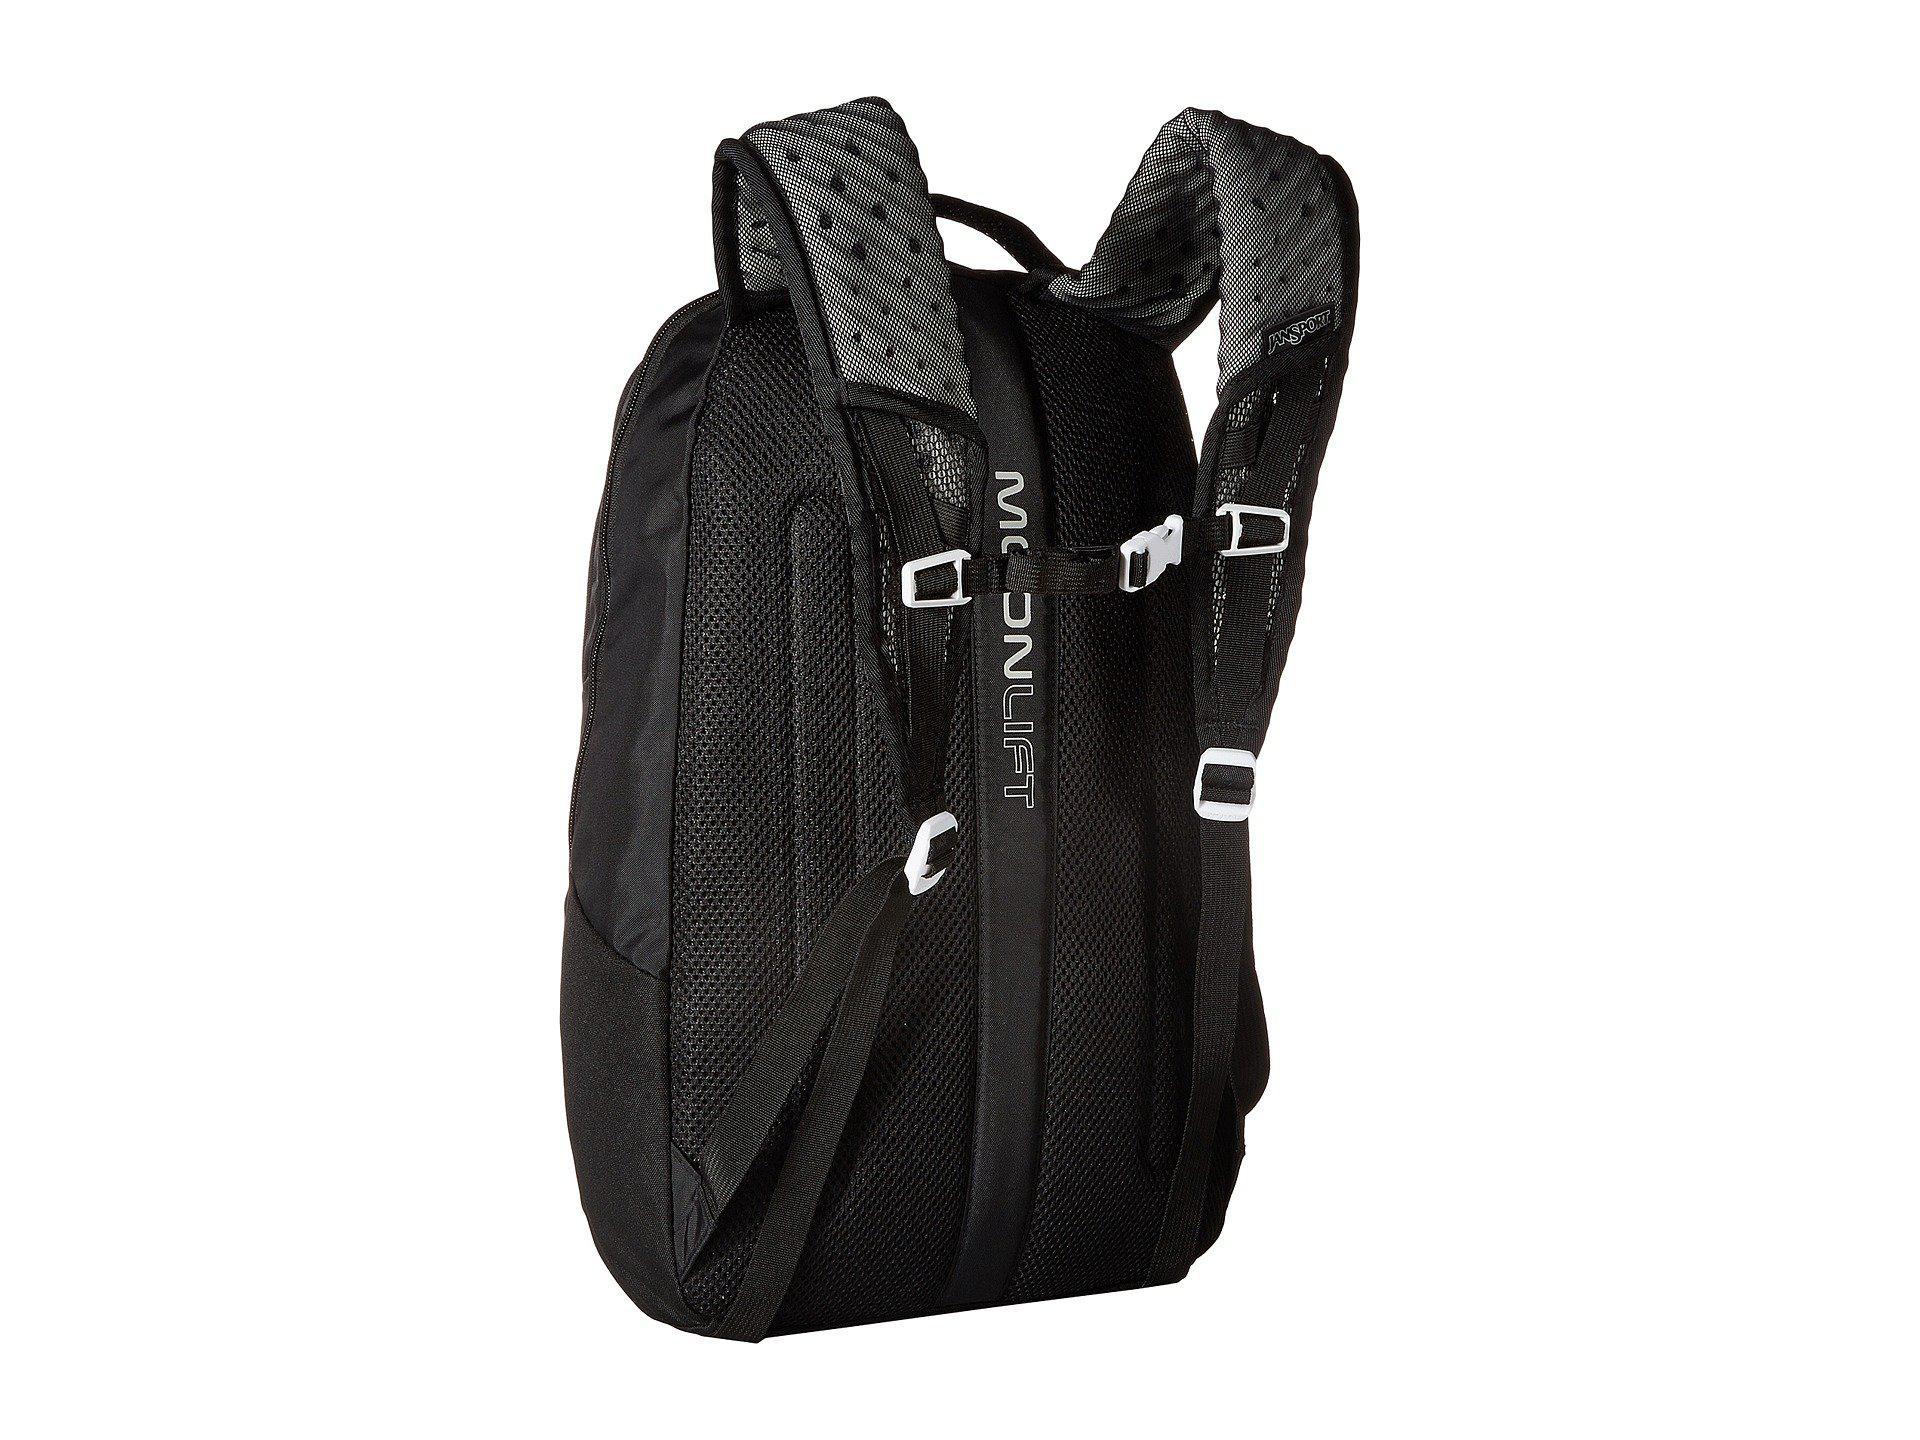 ce7a653463 Lyst - Jansport Helios 25 (black) Backpack Bags in Black for Men